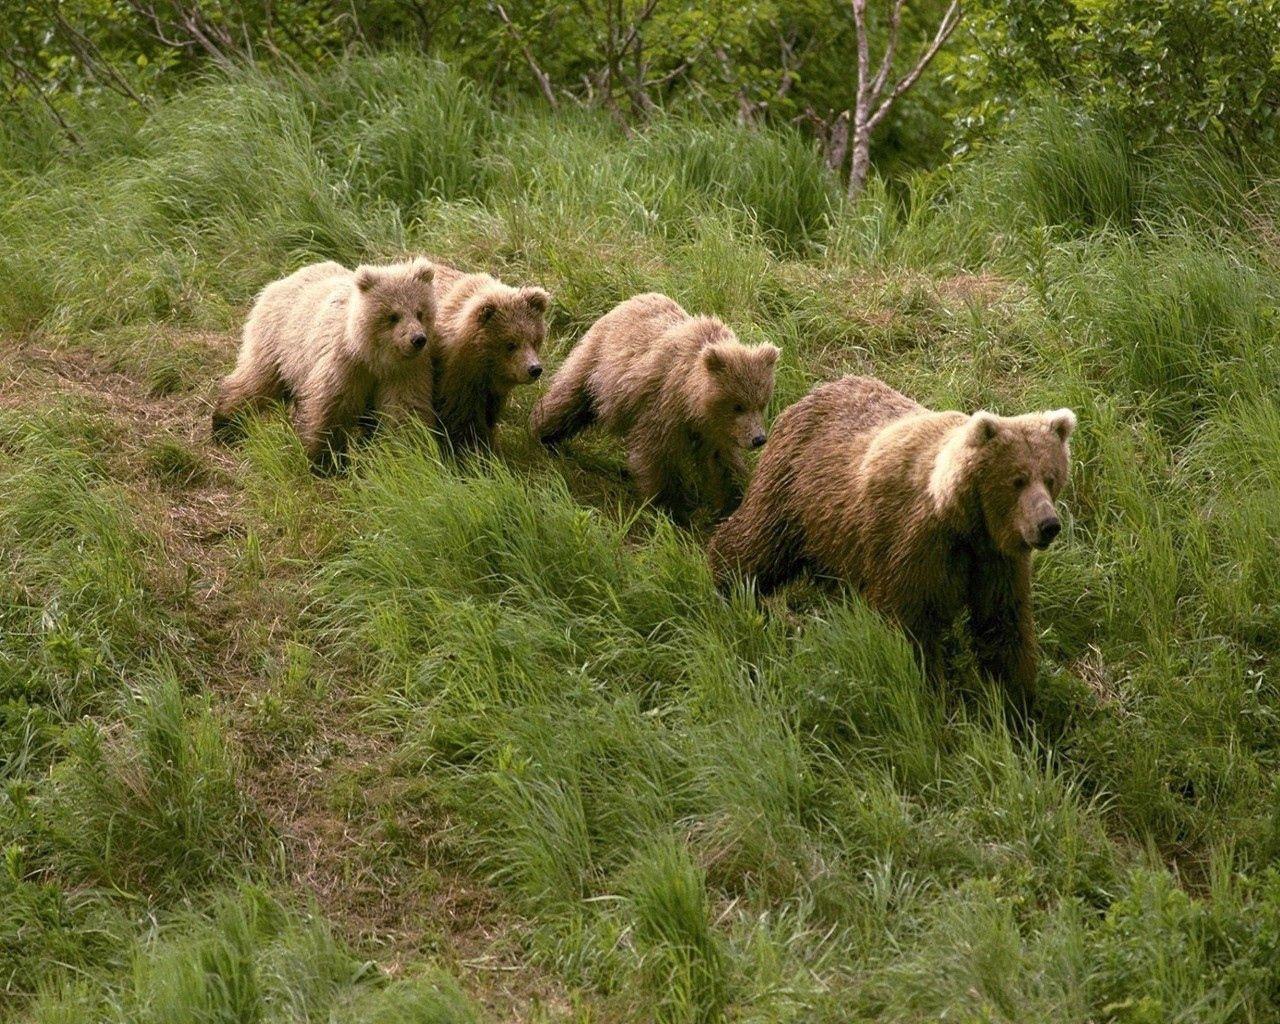 77315 Заставки и Обои Медведи на телефон. Скачать Медведи, Животные, Трава, Прогулка картинки бесплатно